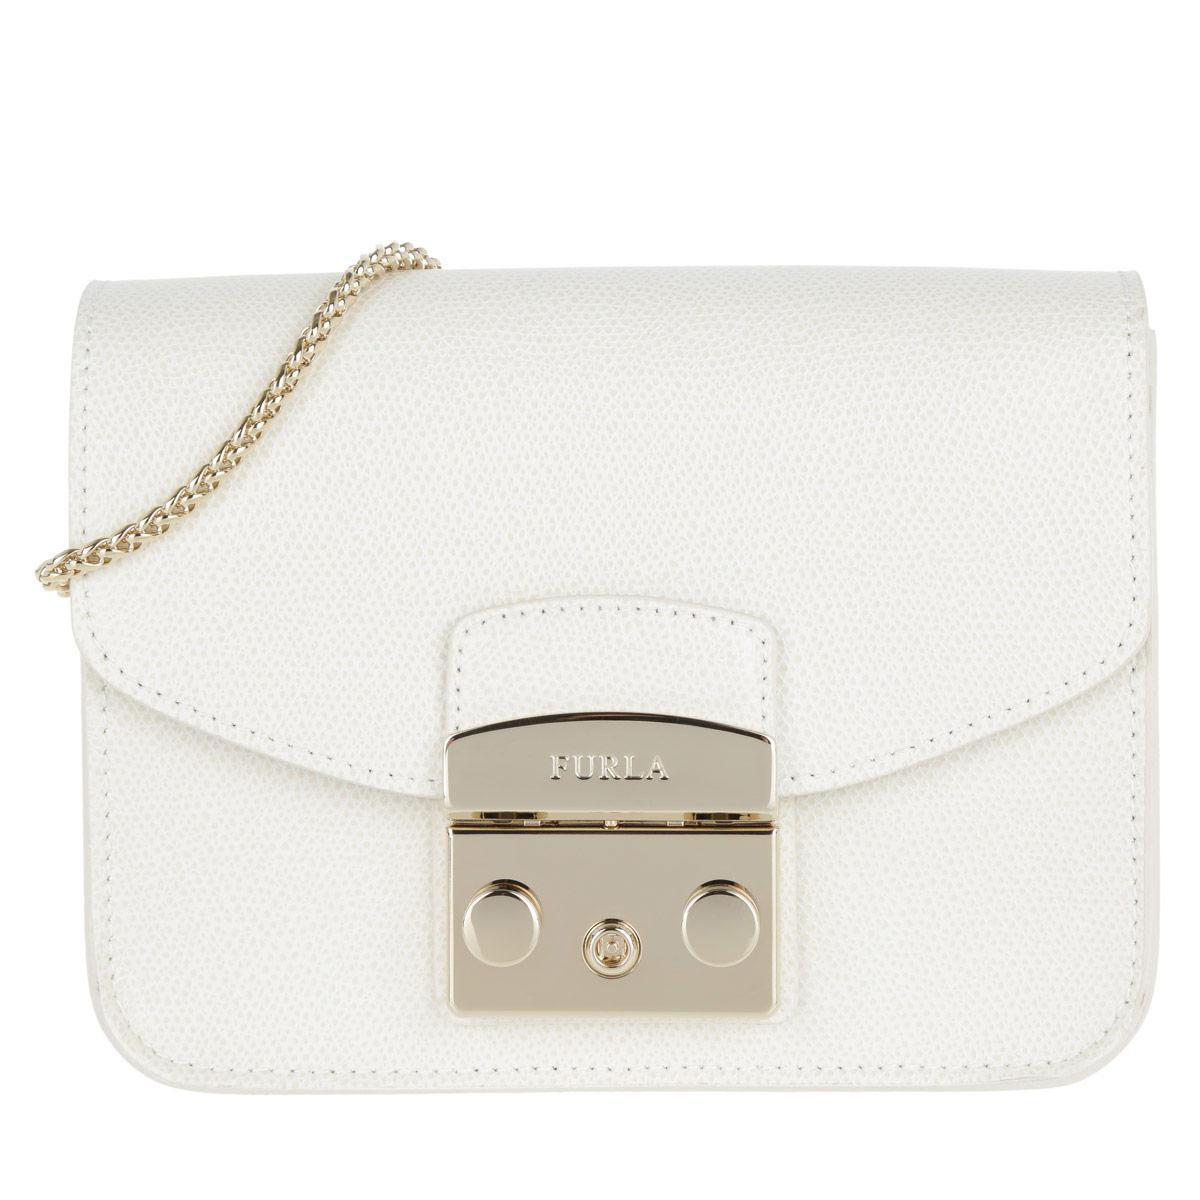 a5effd65f1 Furla - White Metropolis Mini Crossbody Bag Petalo - Lyst. View fullscreen